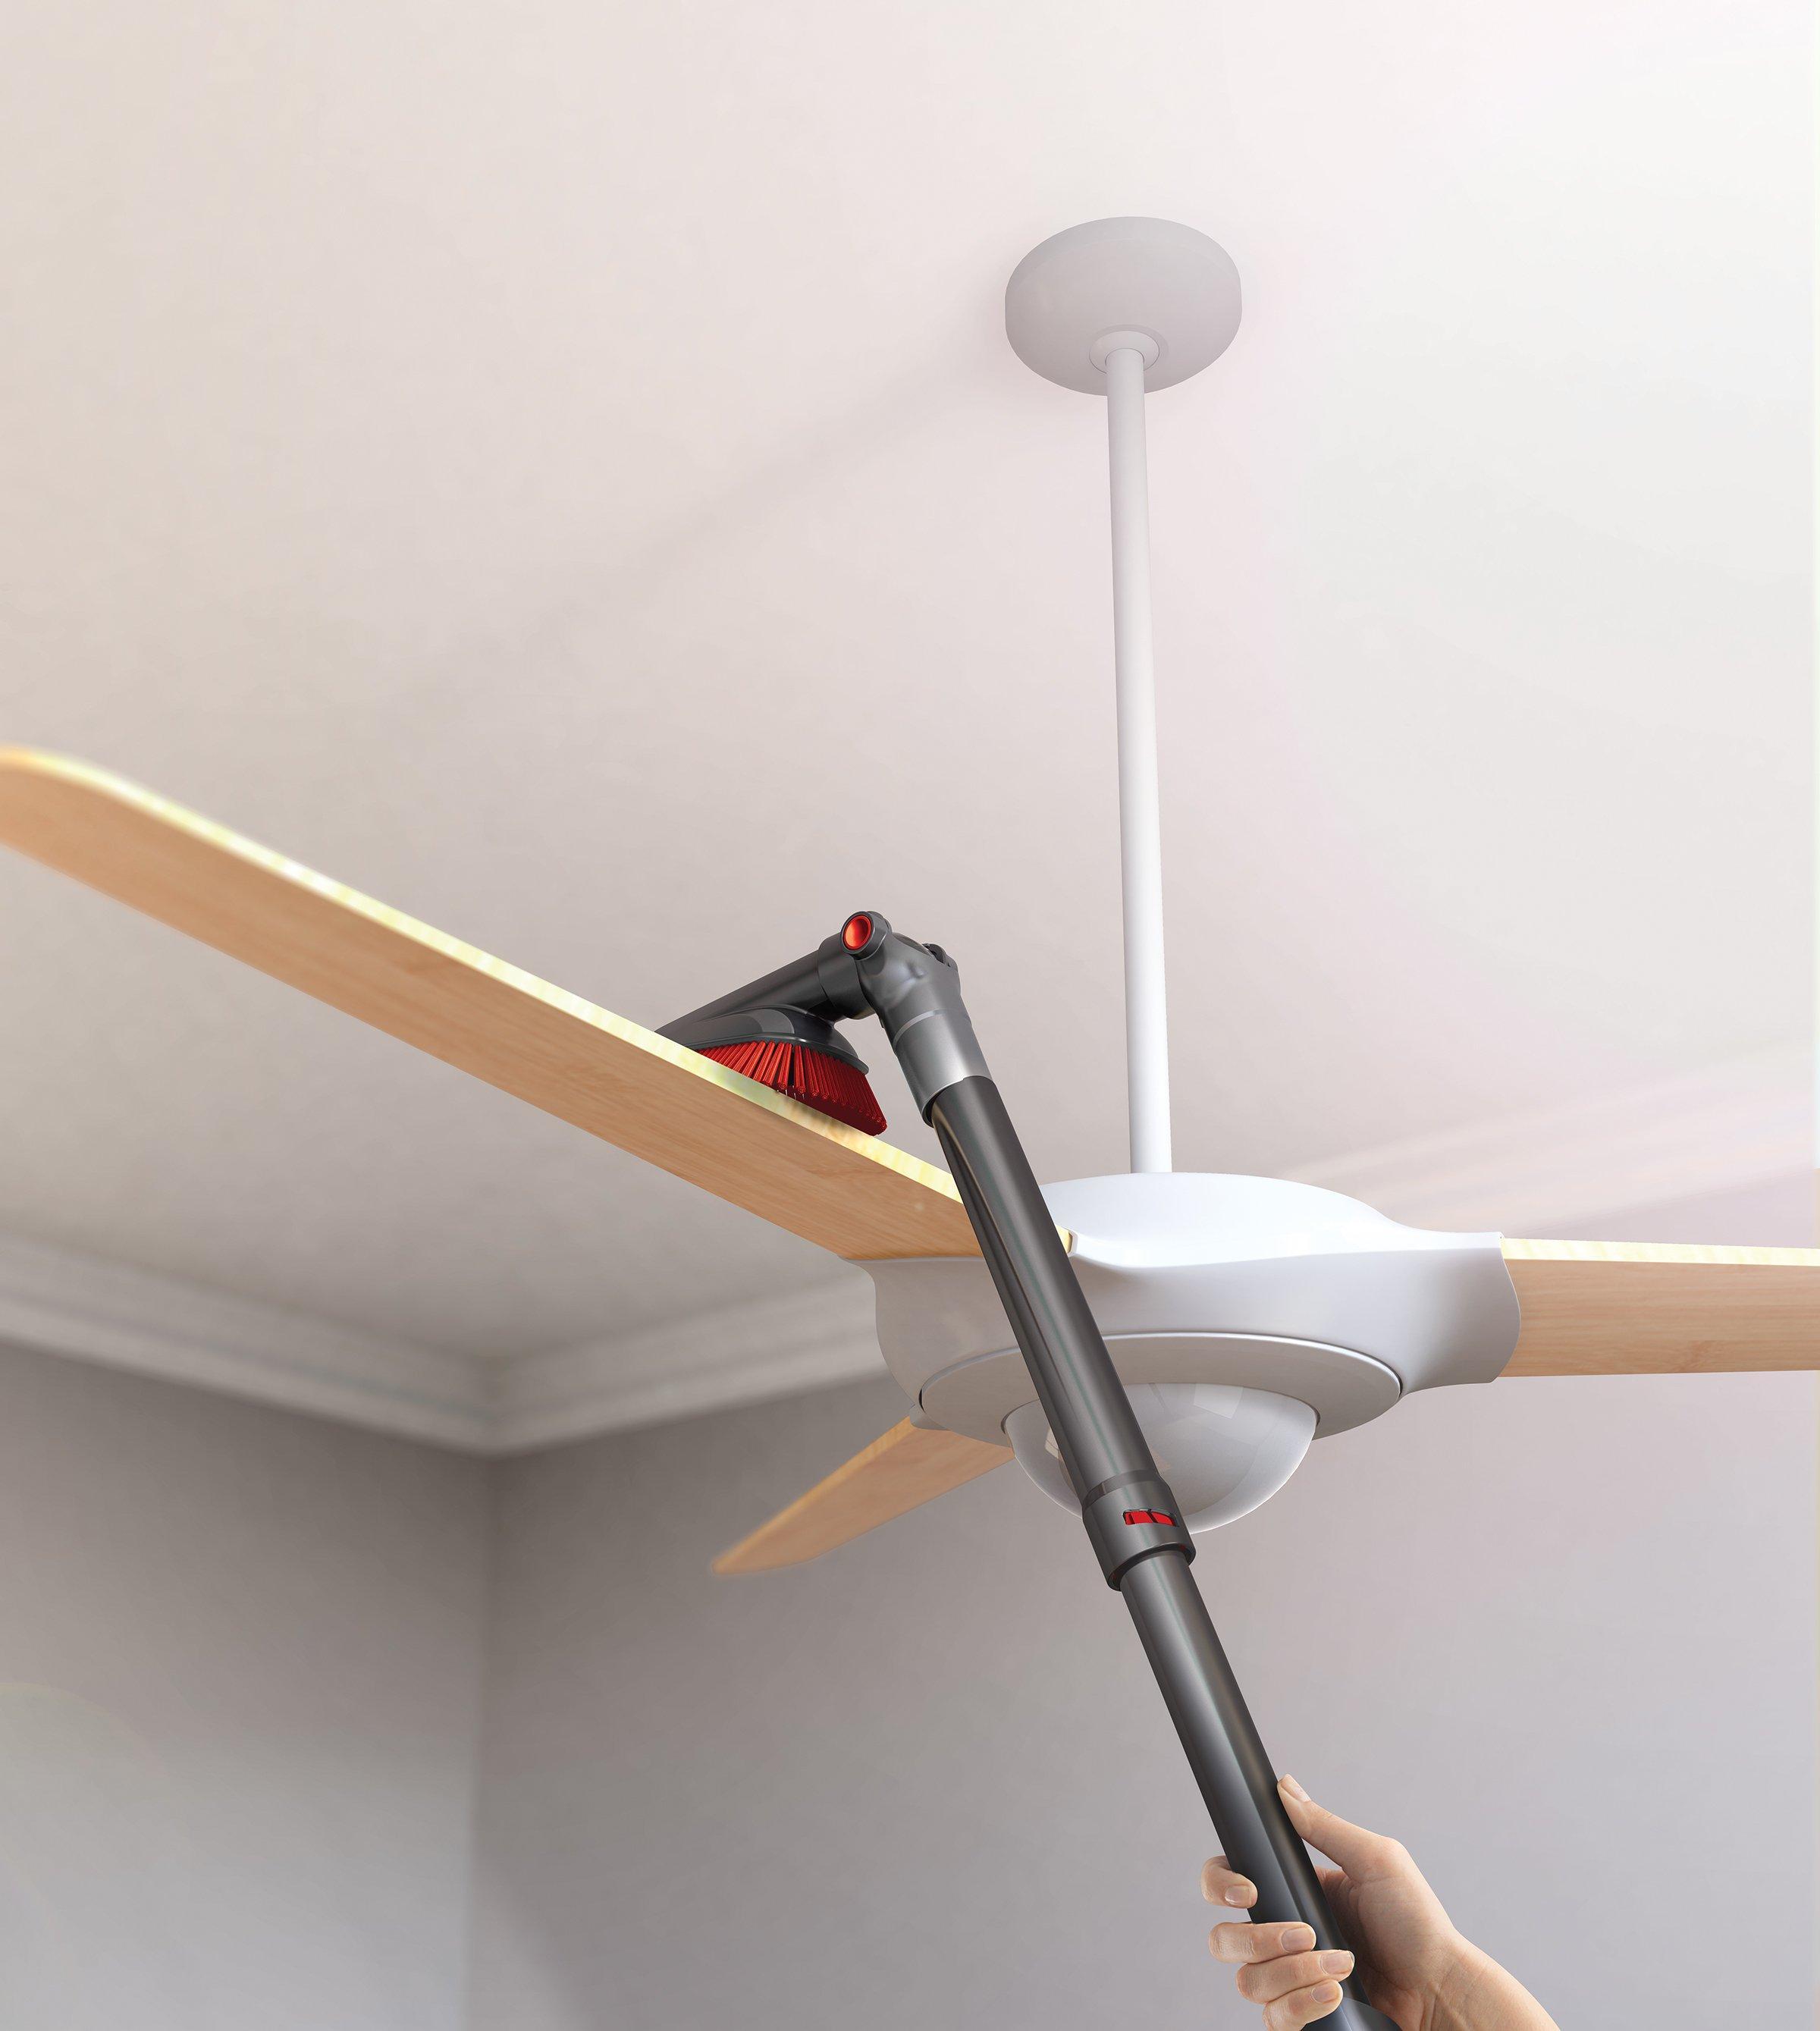 WindTunnel 3 High Performance Plus Upright Vacuum5